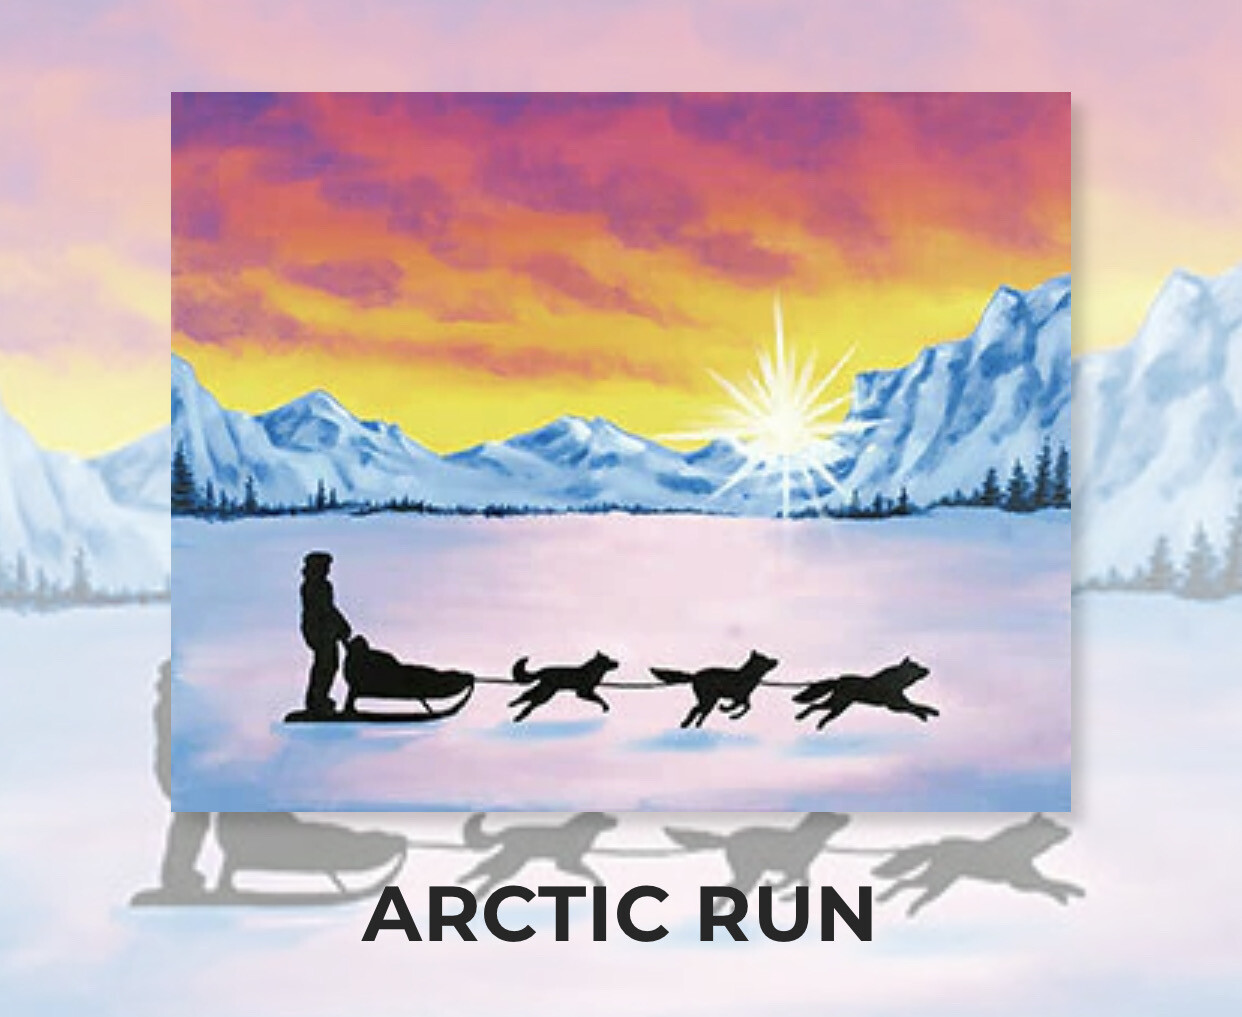 Arctic Run ADULT Acrylic Paint On Canvas DIY Art Kit - 3 Week Special Order